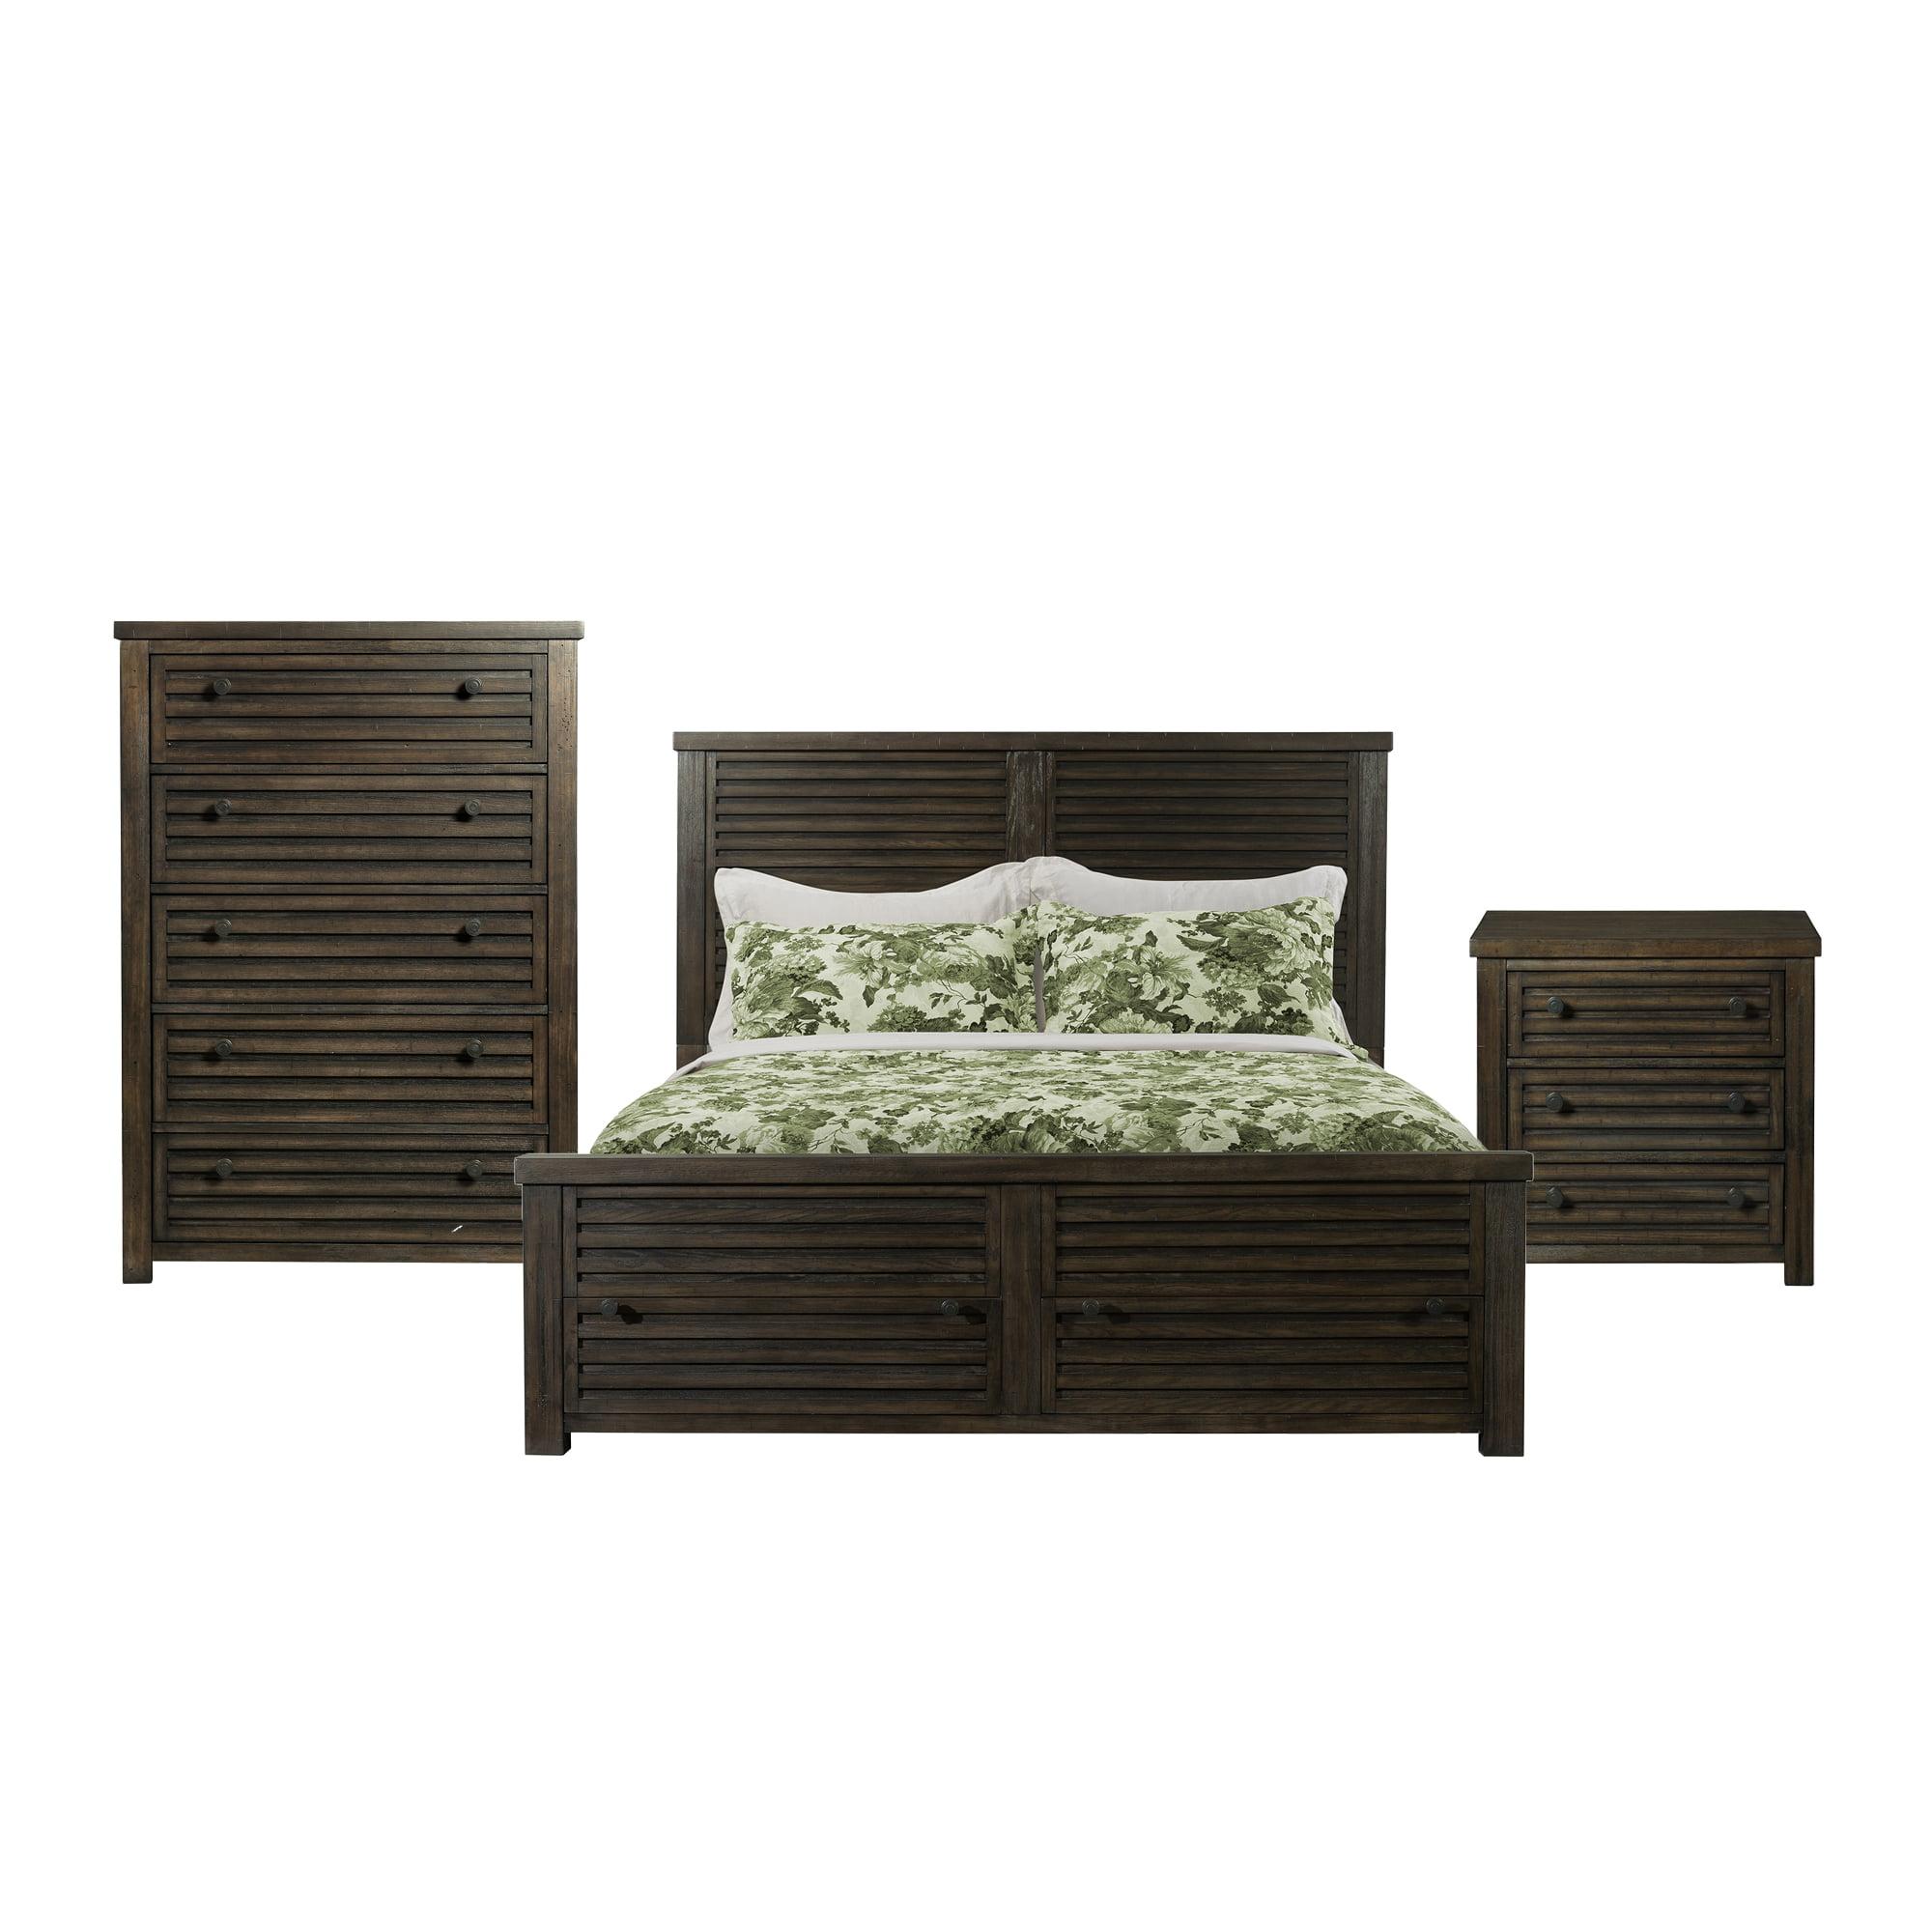 Picket House Furnishings Montego King Storage 3PC Bedroom Set